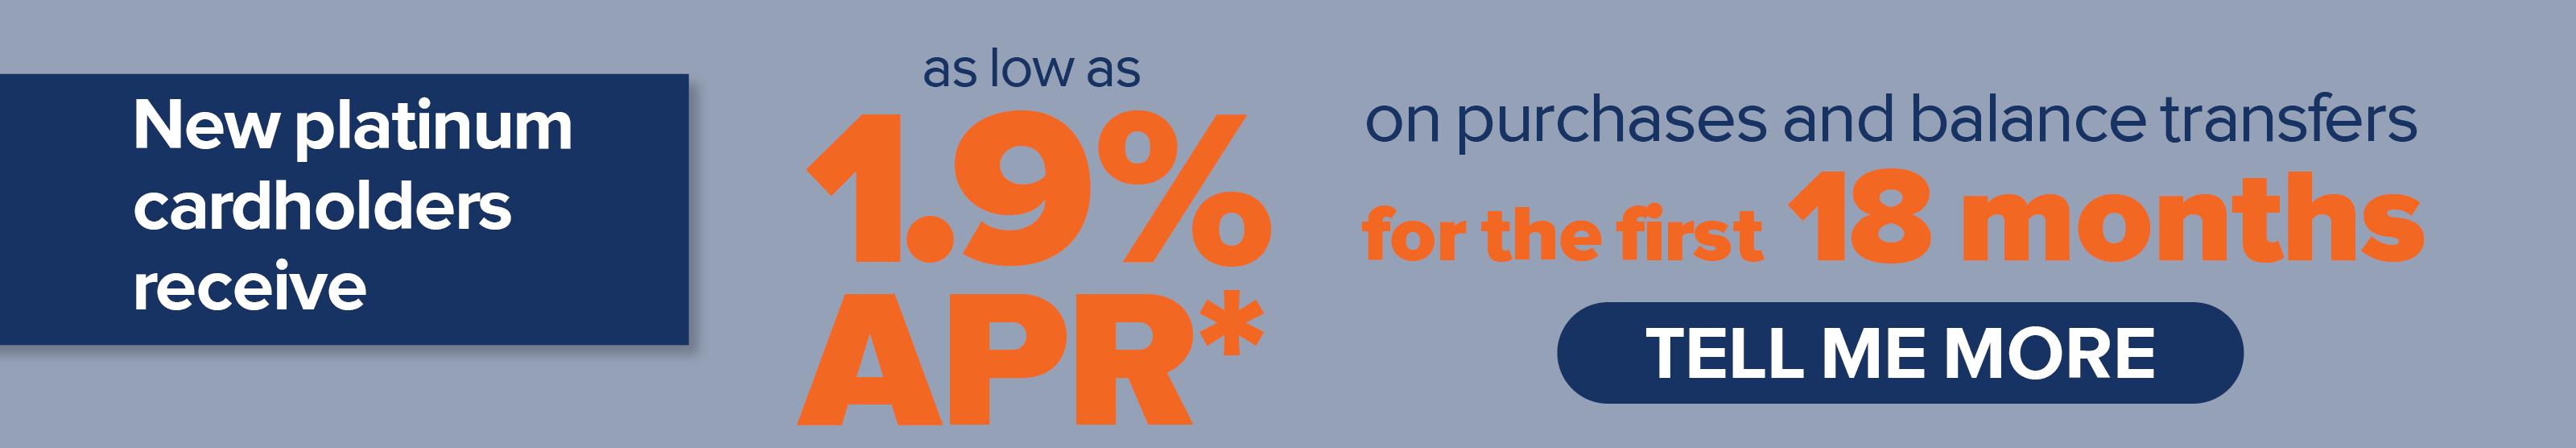 UICCU 1.9% APR* on Purchases & Balance Transfers Visa Promo